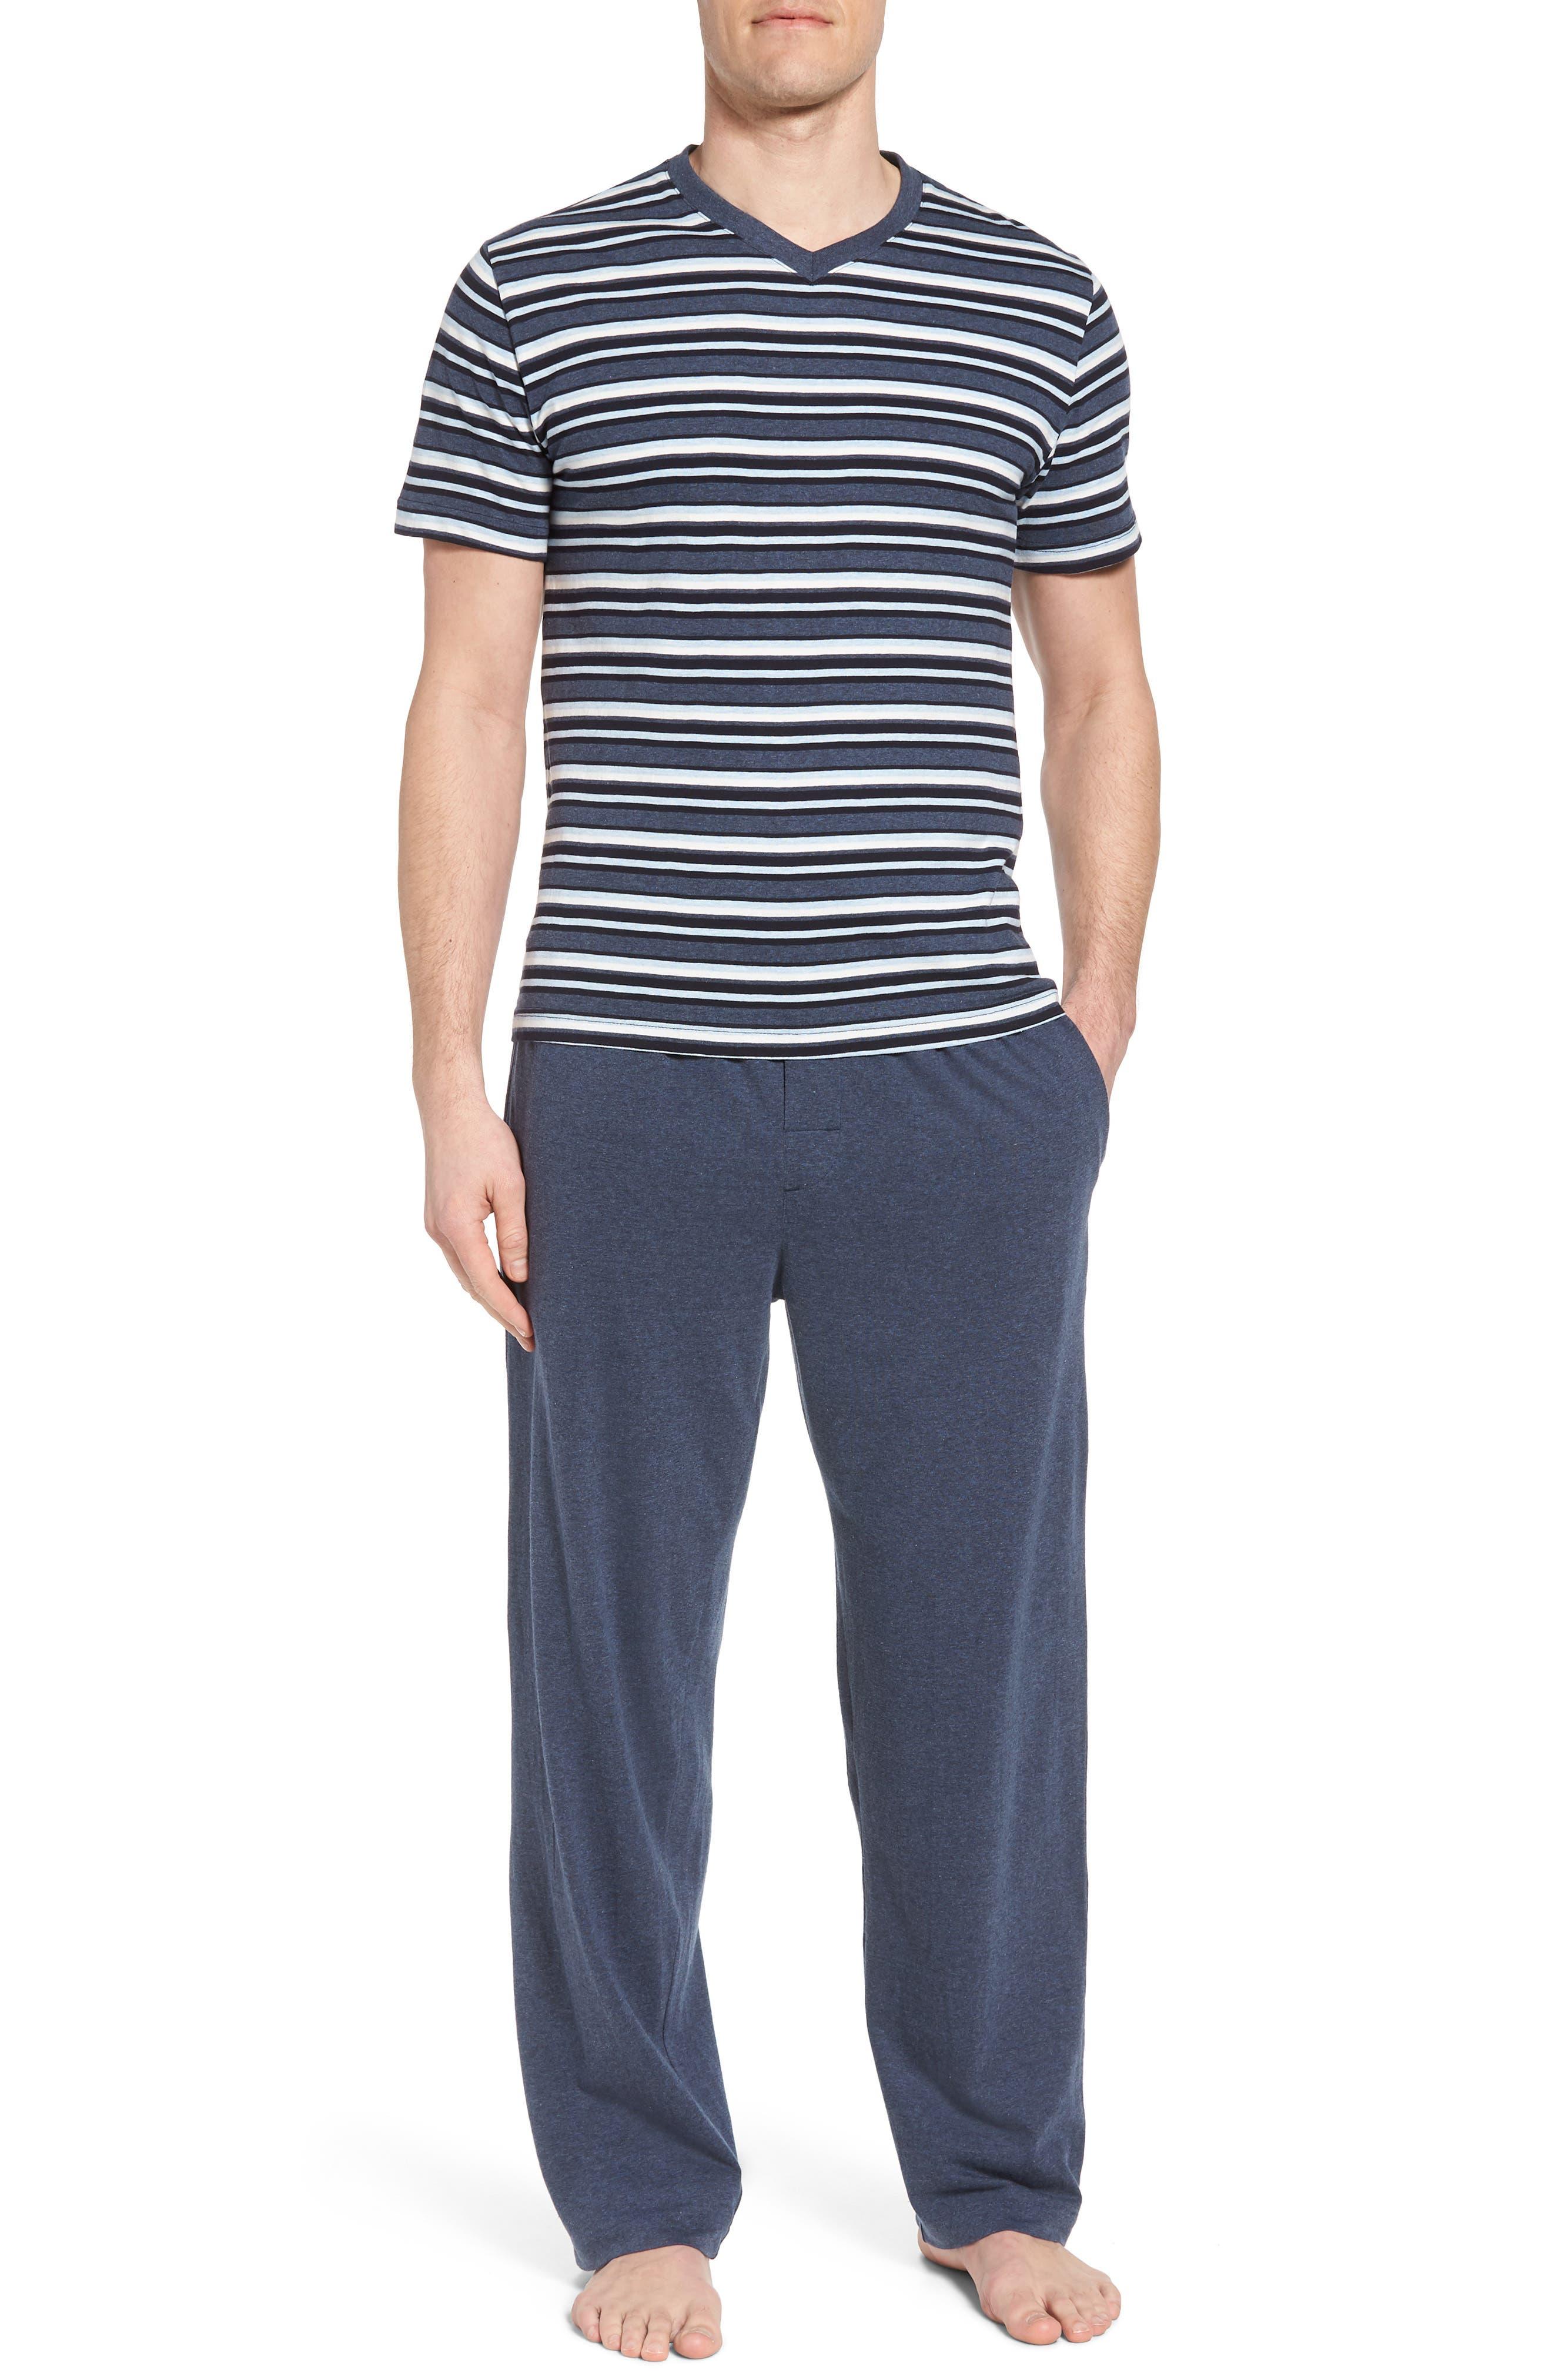 Majetic International Sleep On It Pajama Set,                         Main,                         color, Alfresco Stripe